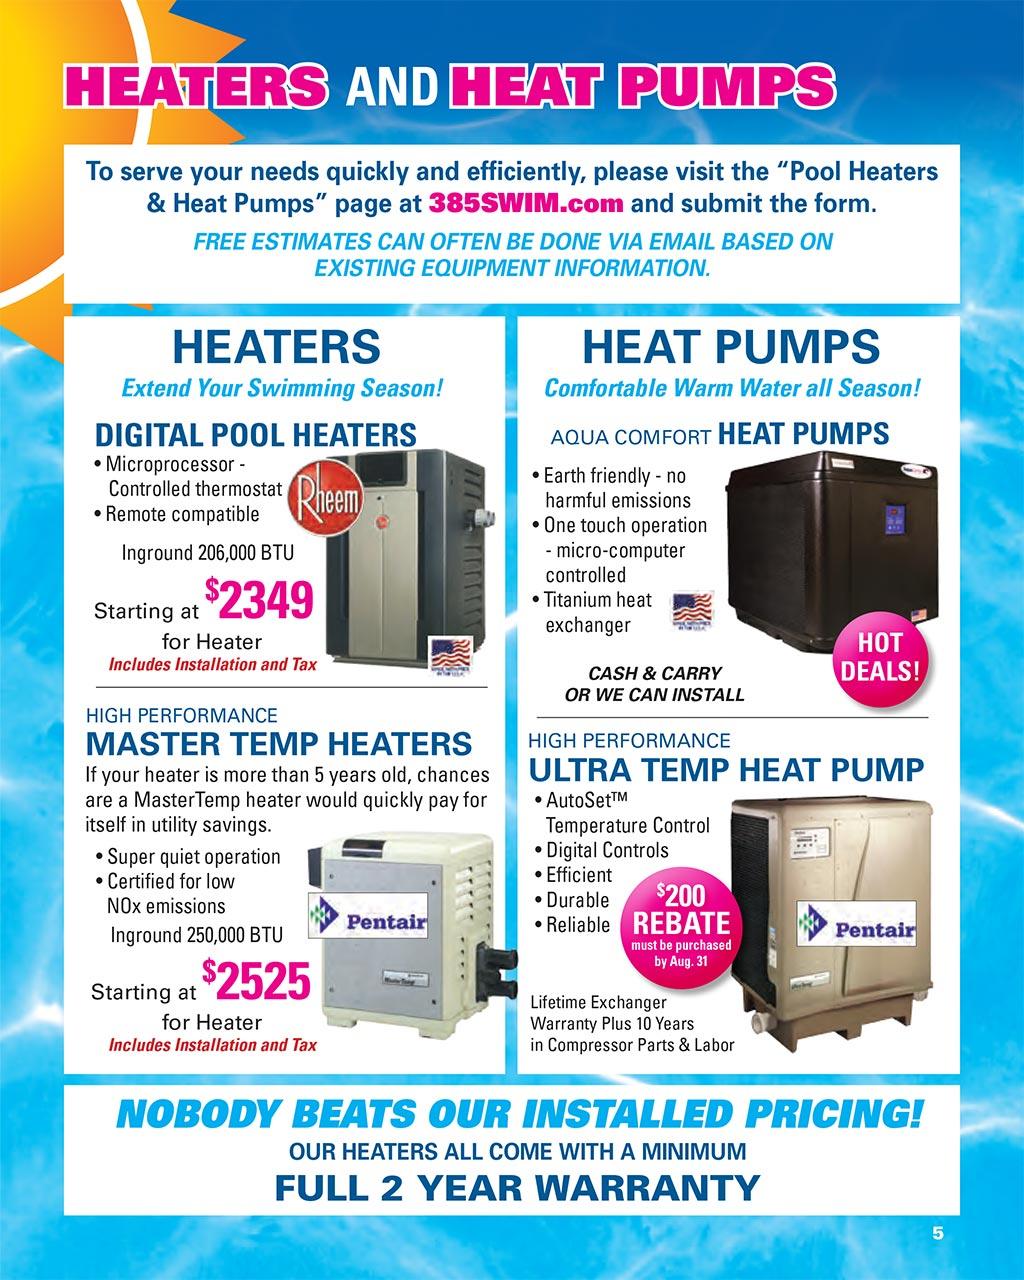 Pool Heaters & Heat Pumps - North Eastern Pools & Spas